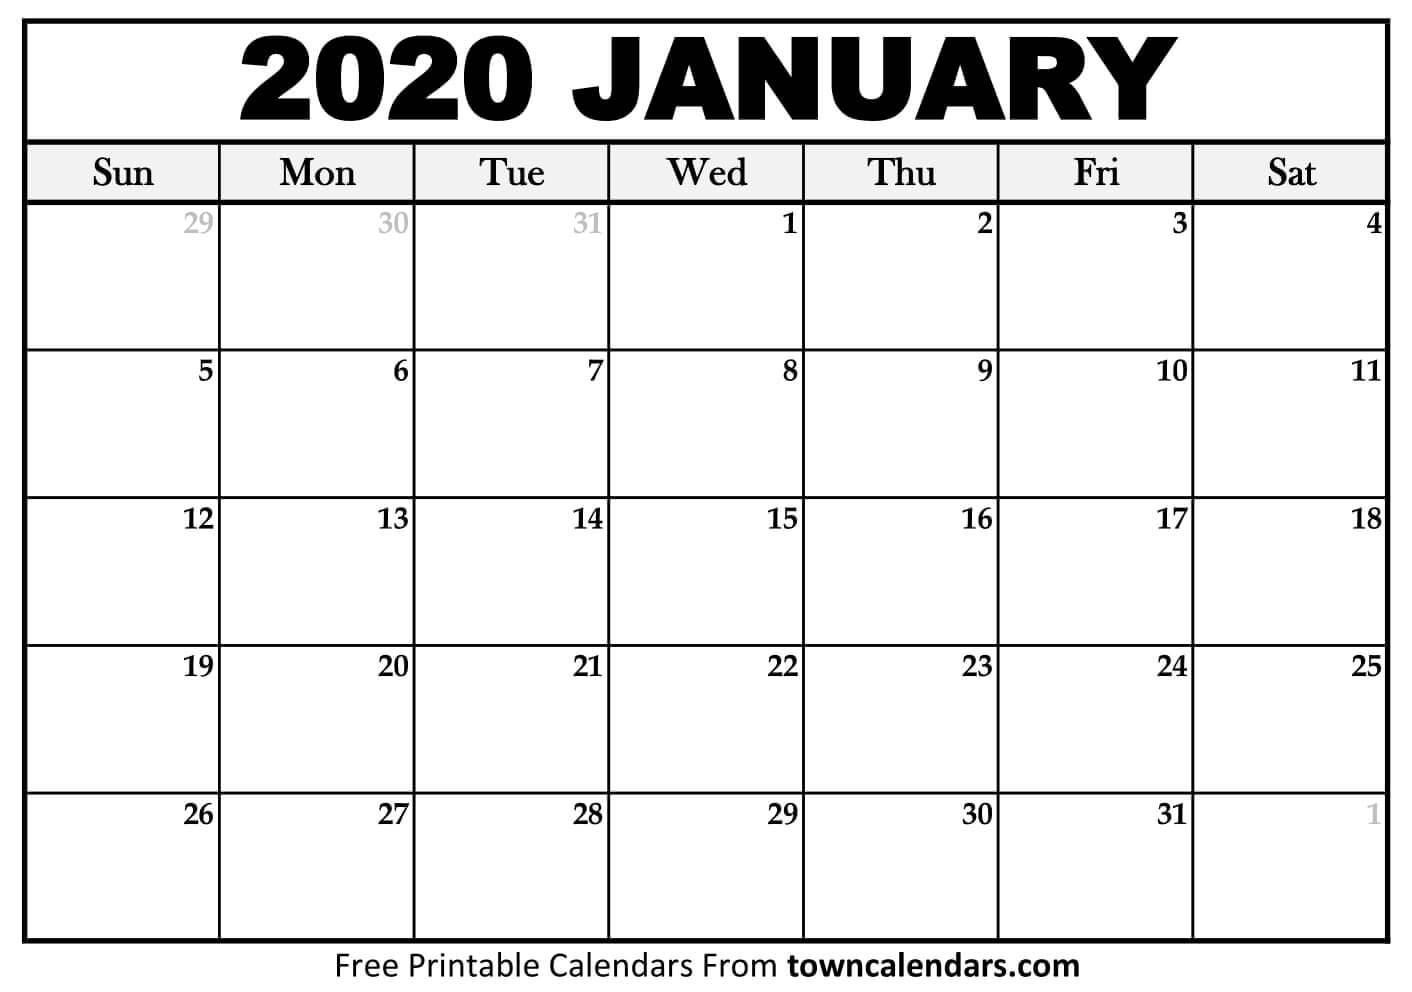 Printable January 2020 Calendar  Towncalendars intended for Jan 2020 Printable Calendar